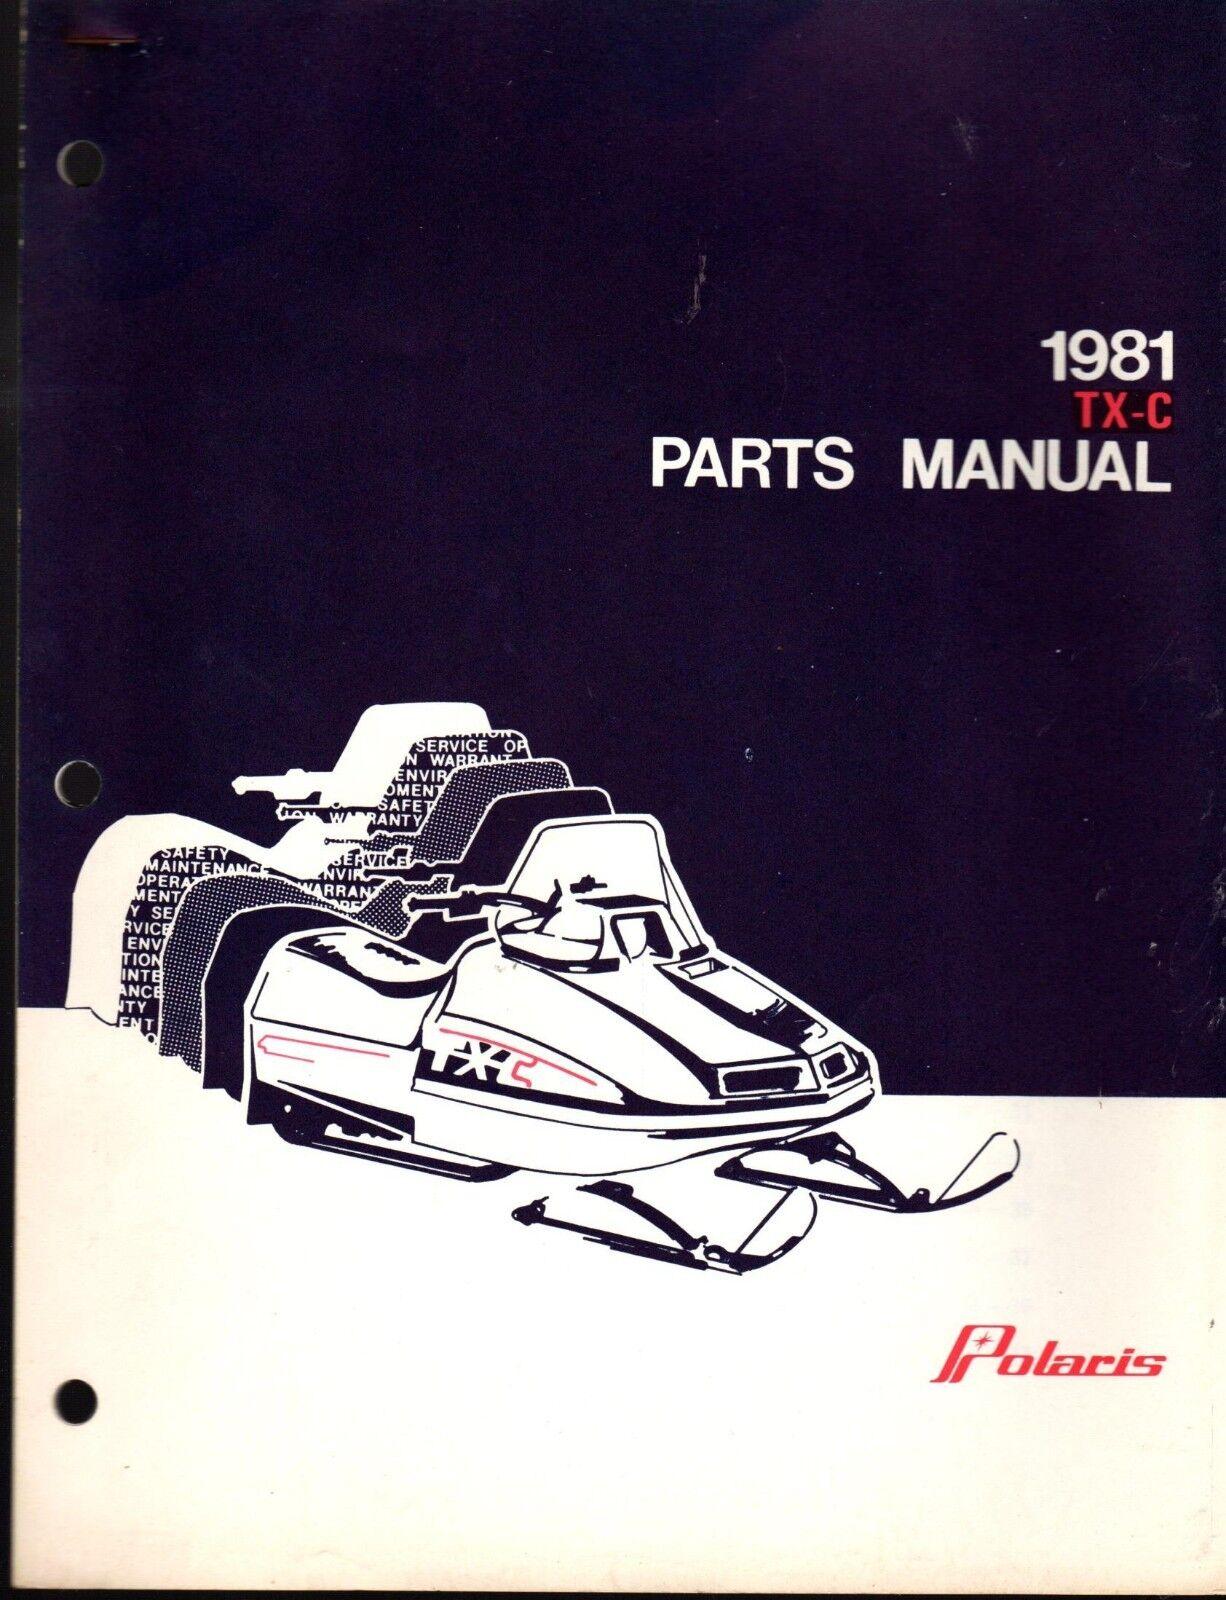 VINTAGE 1981 POLARIS TX-C SNOWMOBILE PARTS MANUAL NEW P N 9910727  (419)